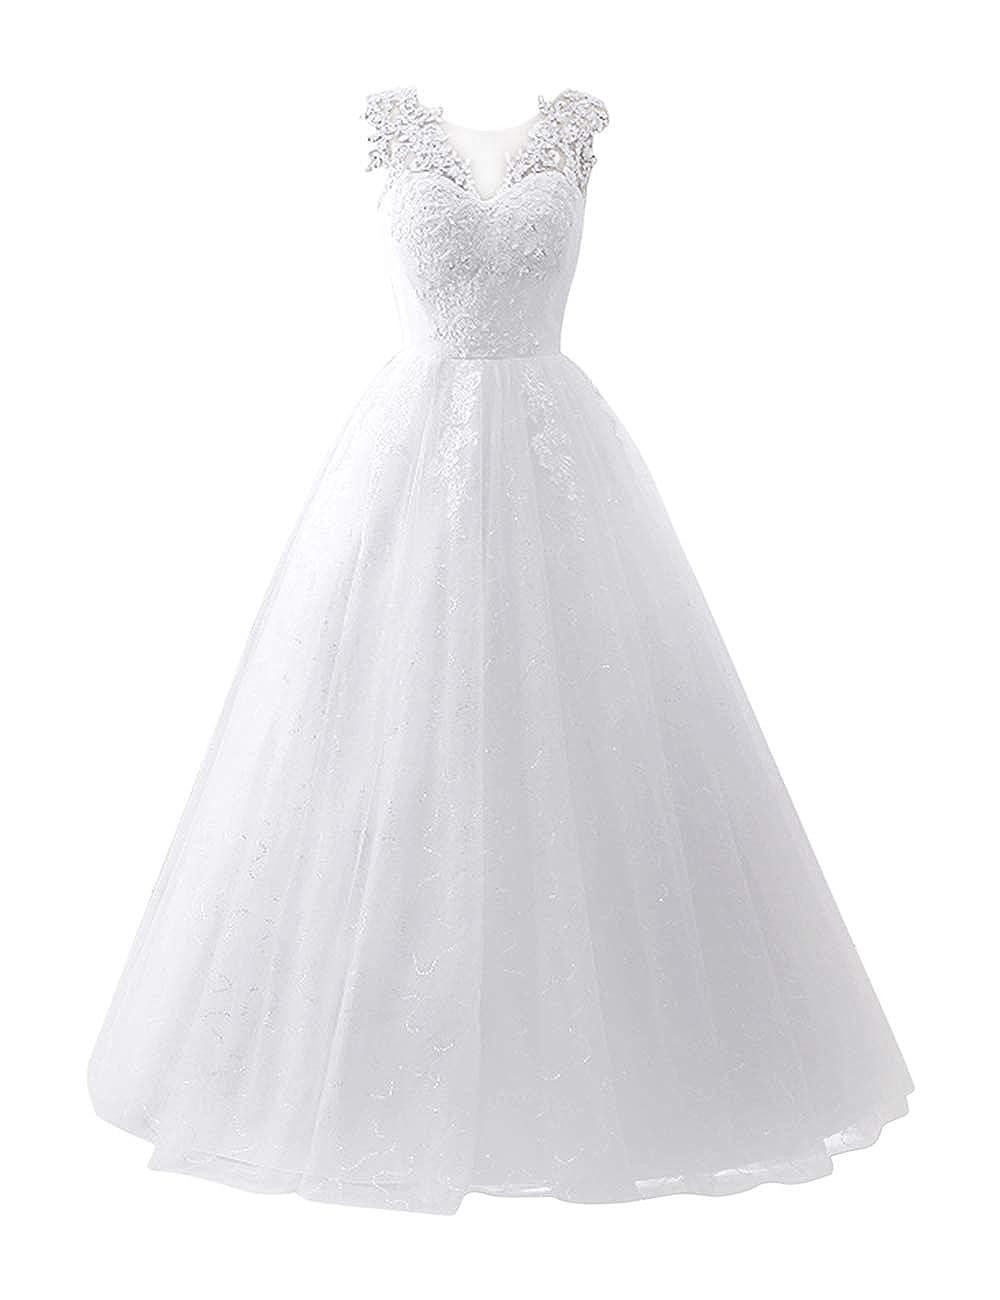 Brautkleid Lang Ausschnitt Besbomig V Ärmellos Damen DH29EYeWI